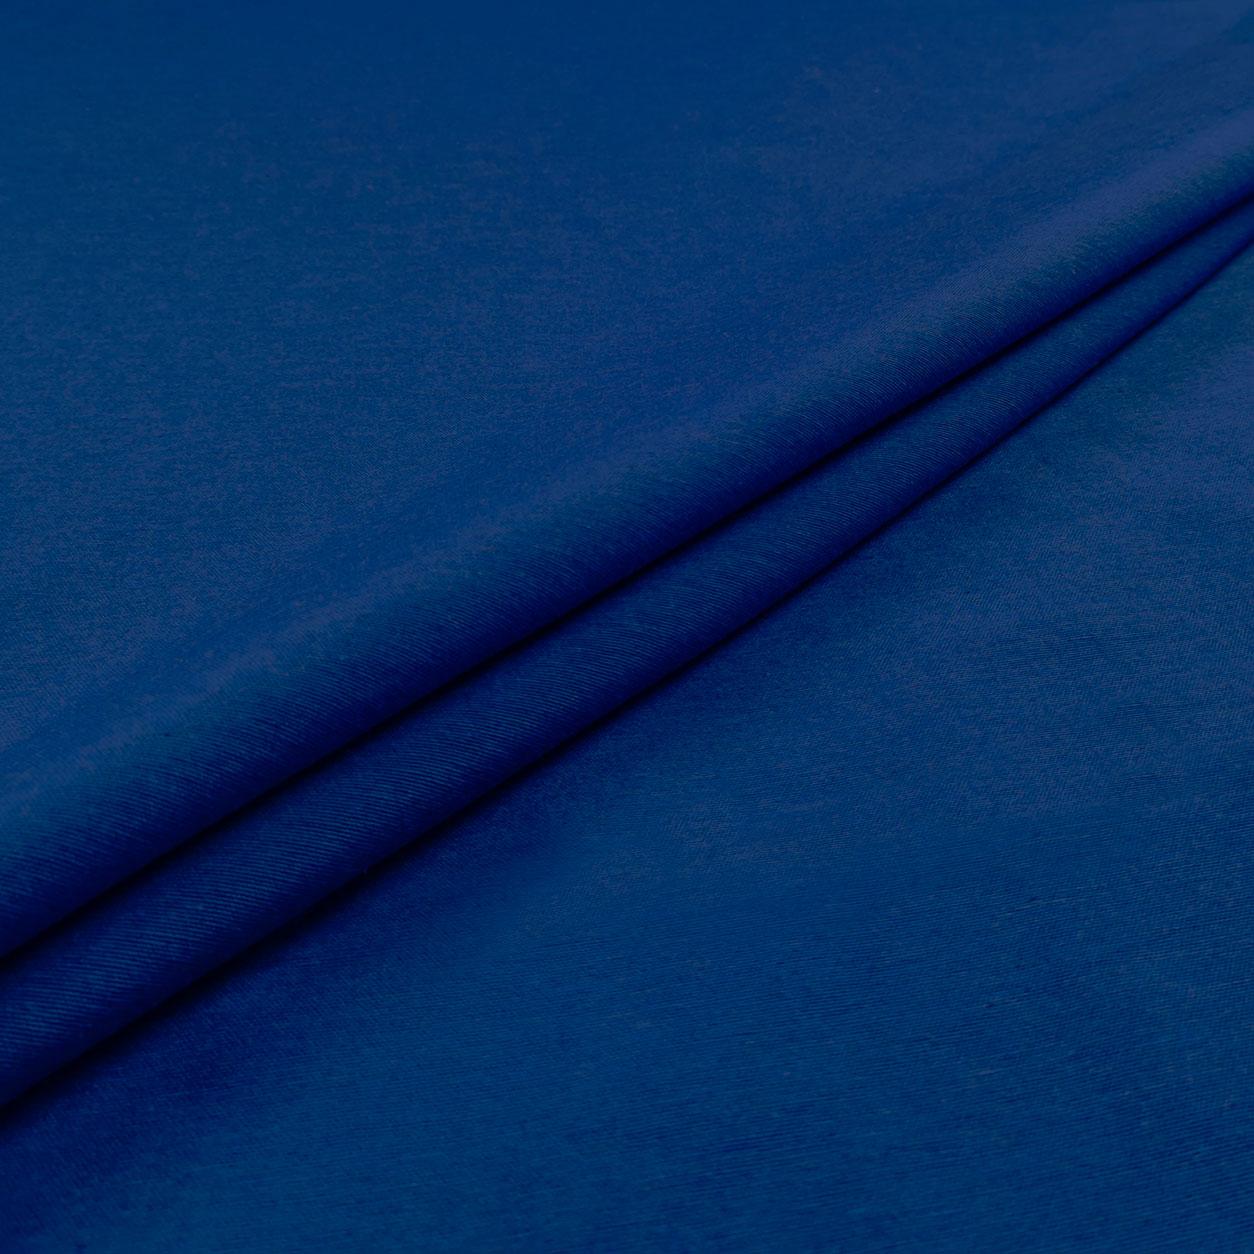 Tessuto Misto Cotone Tinta Unita Blu